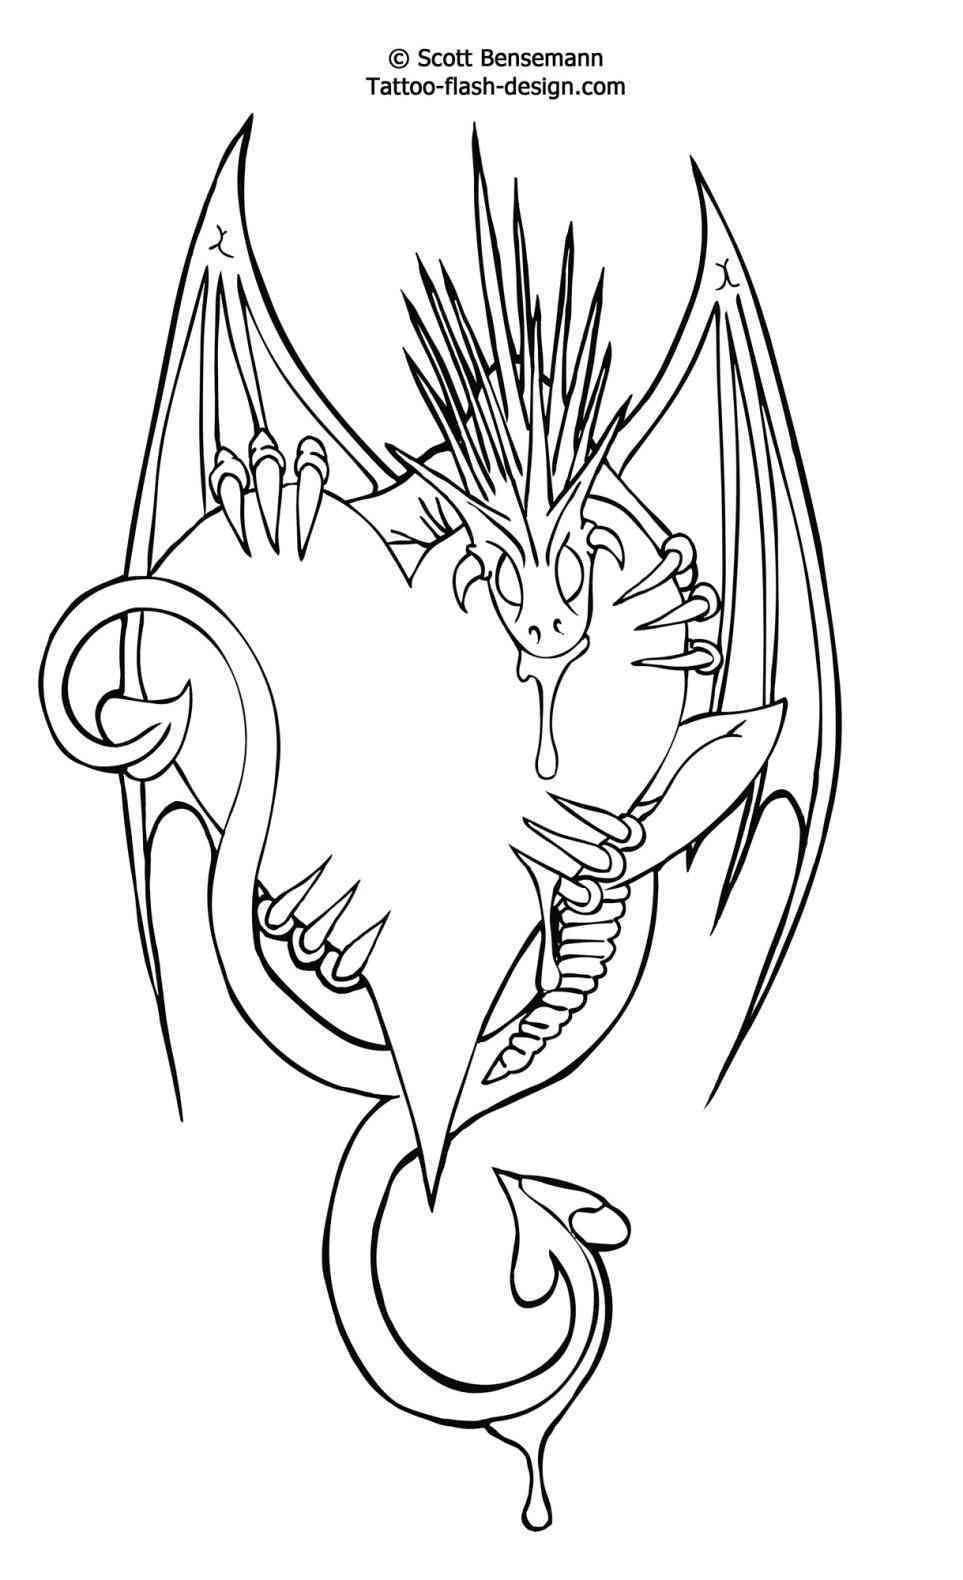 Knot-Design-Free-Flash-Love-Heart-Dragon-Printable-Castle-B-Free - Free Tattoo Stencils Printable